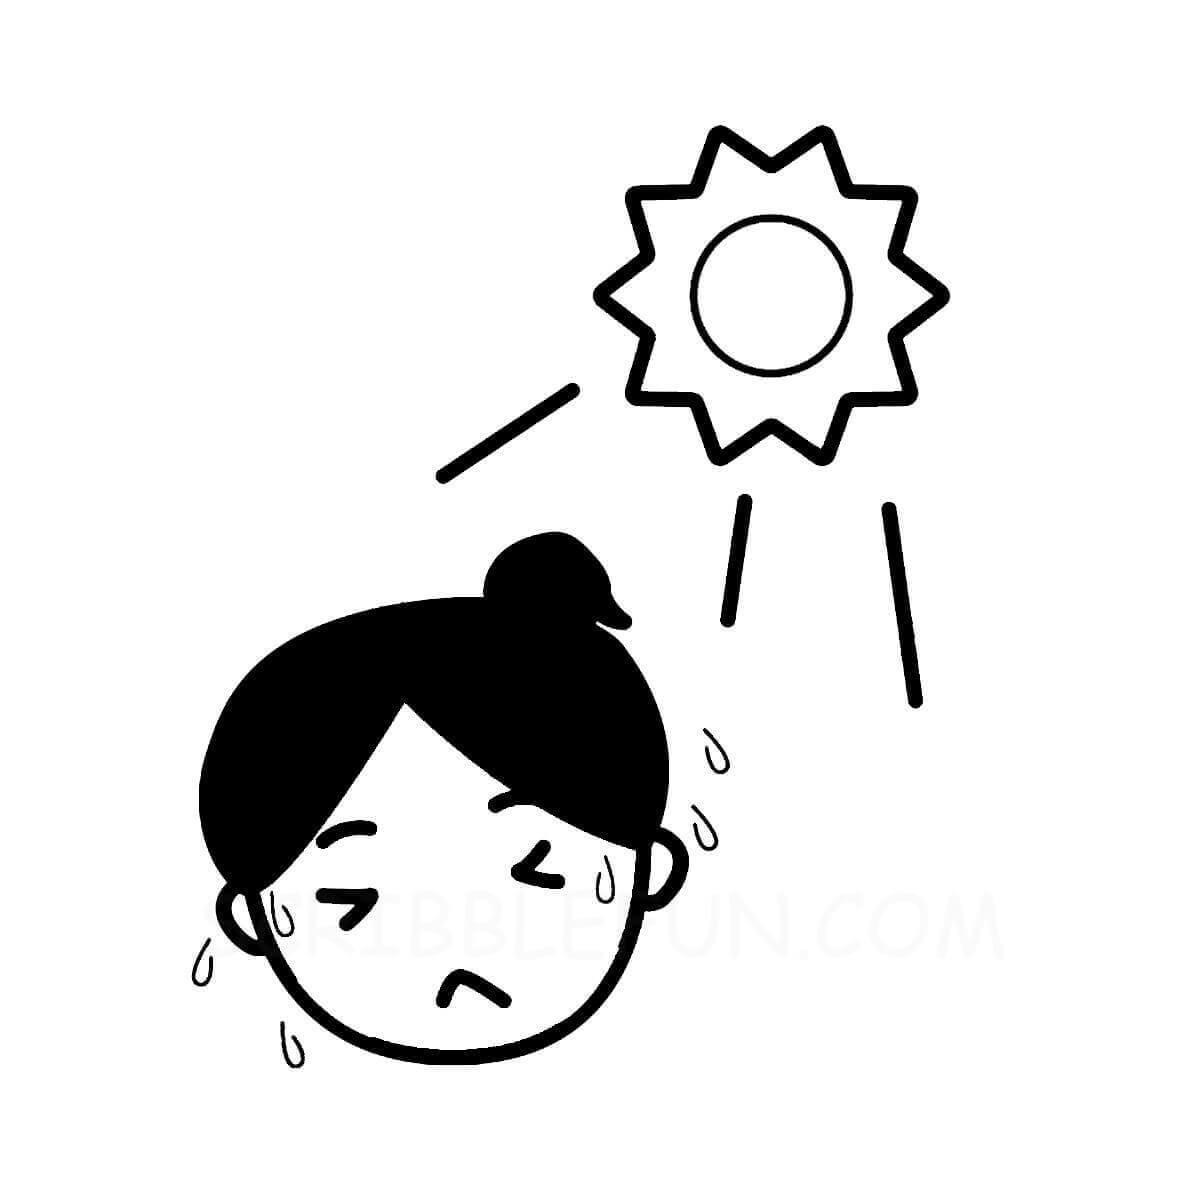 Sun makes one sweaty